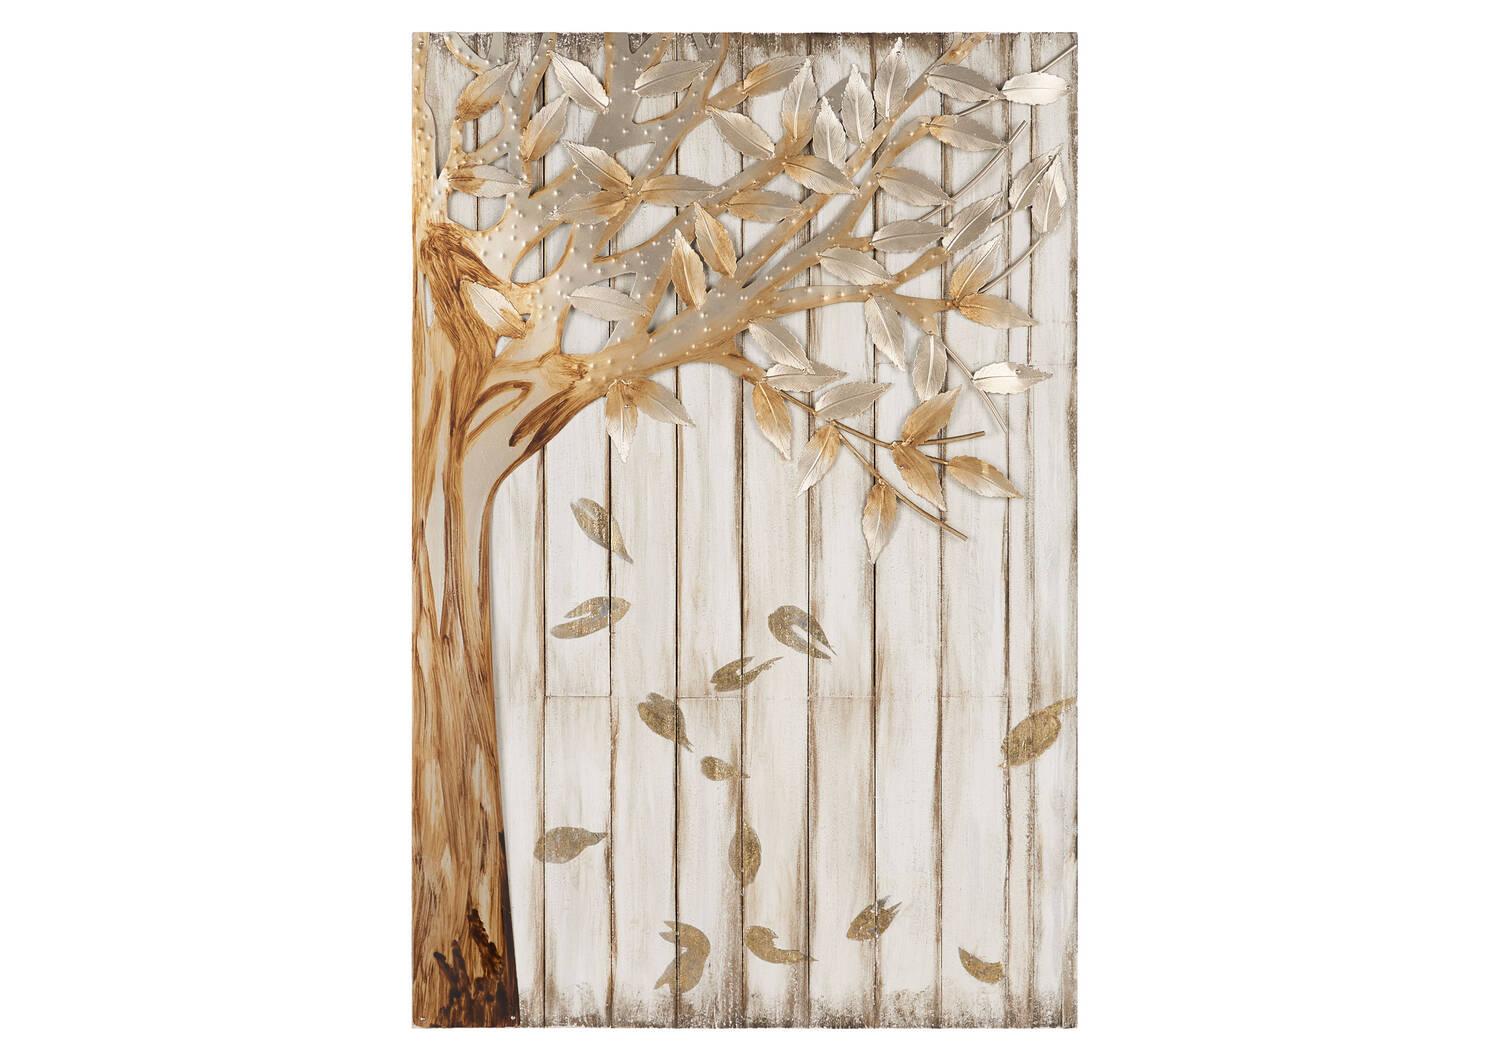 Falling Leaves Wall Decor